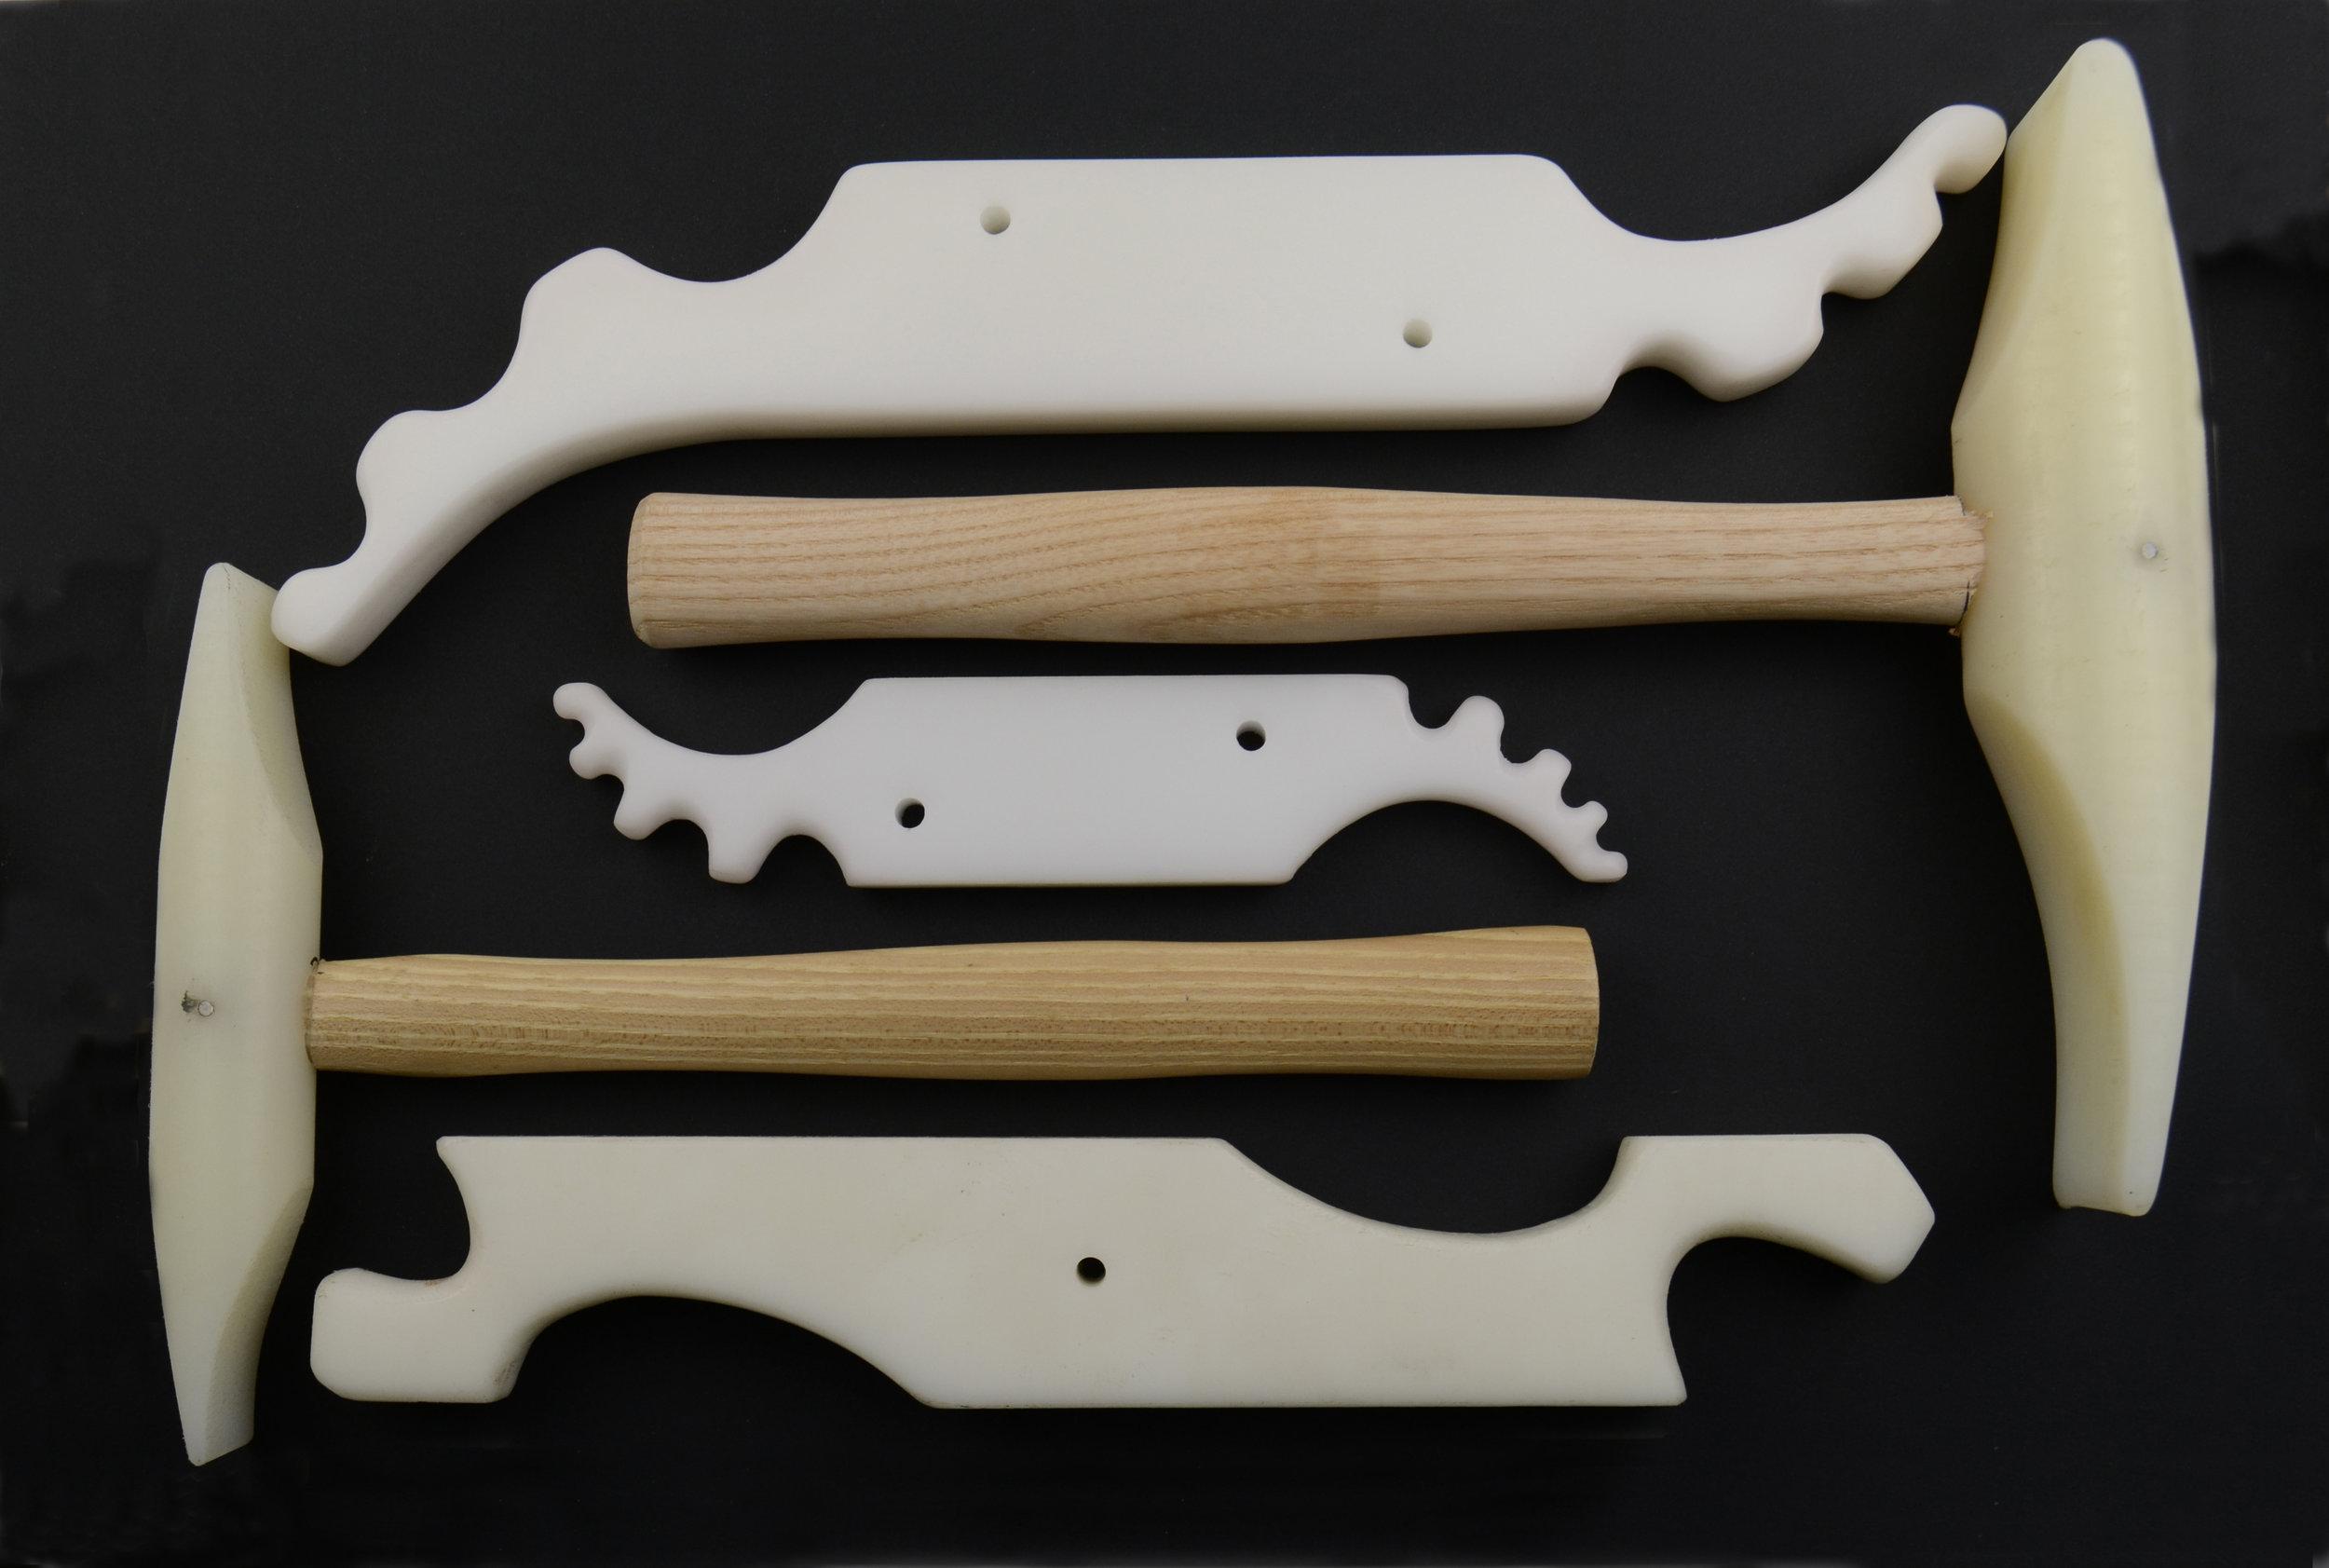 Anticlastic raising tools